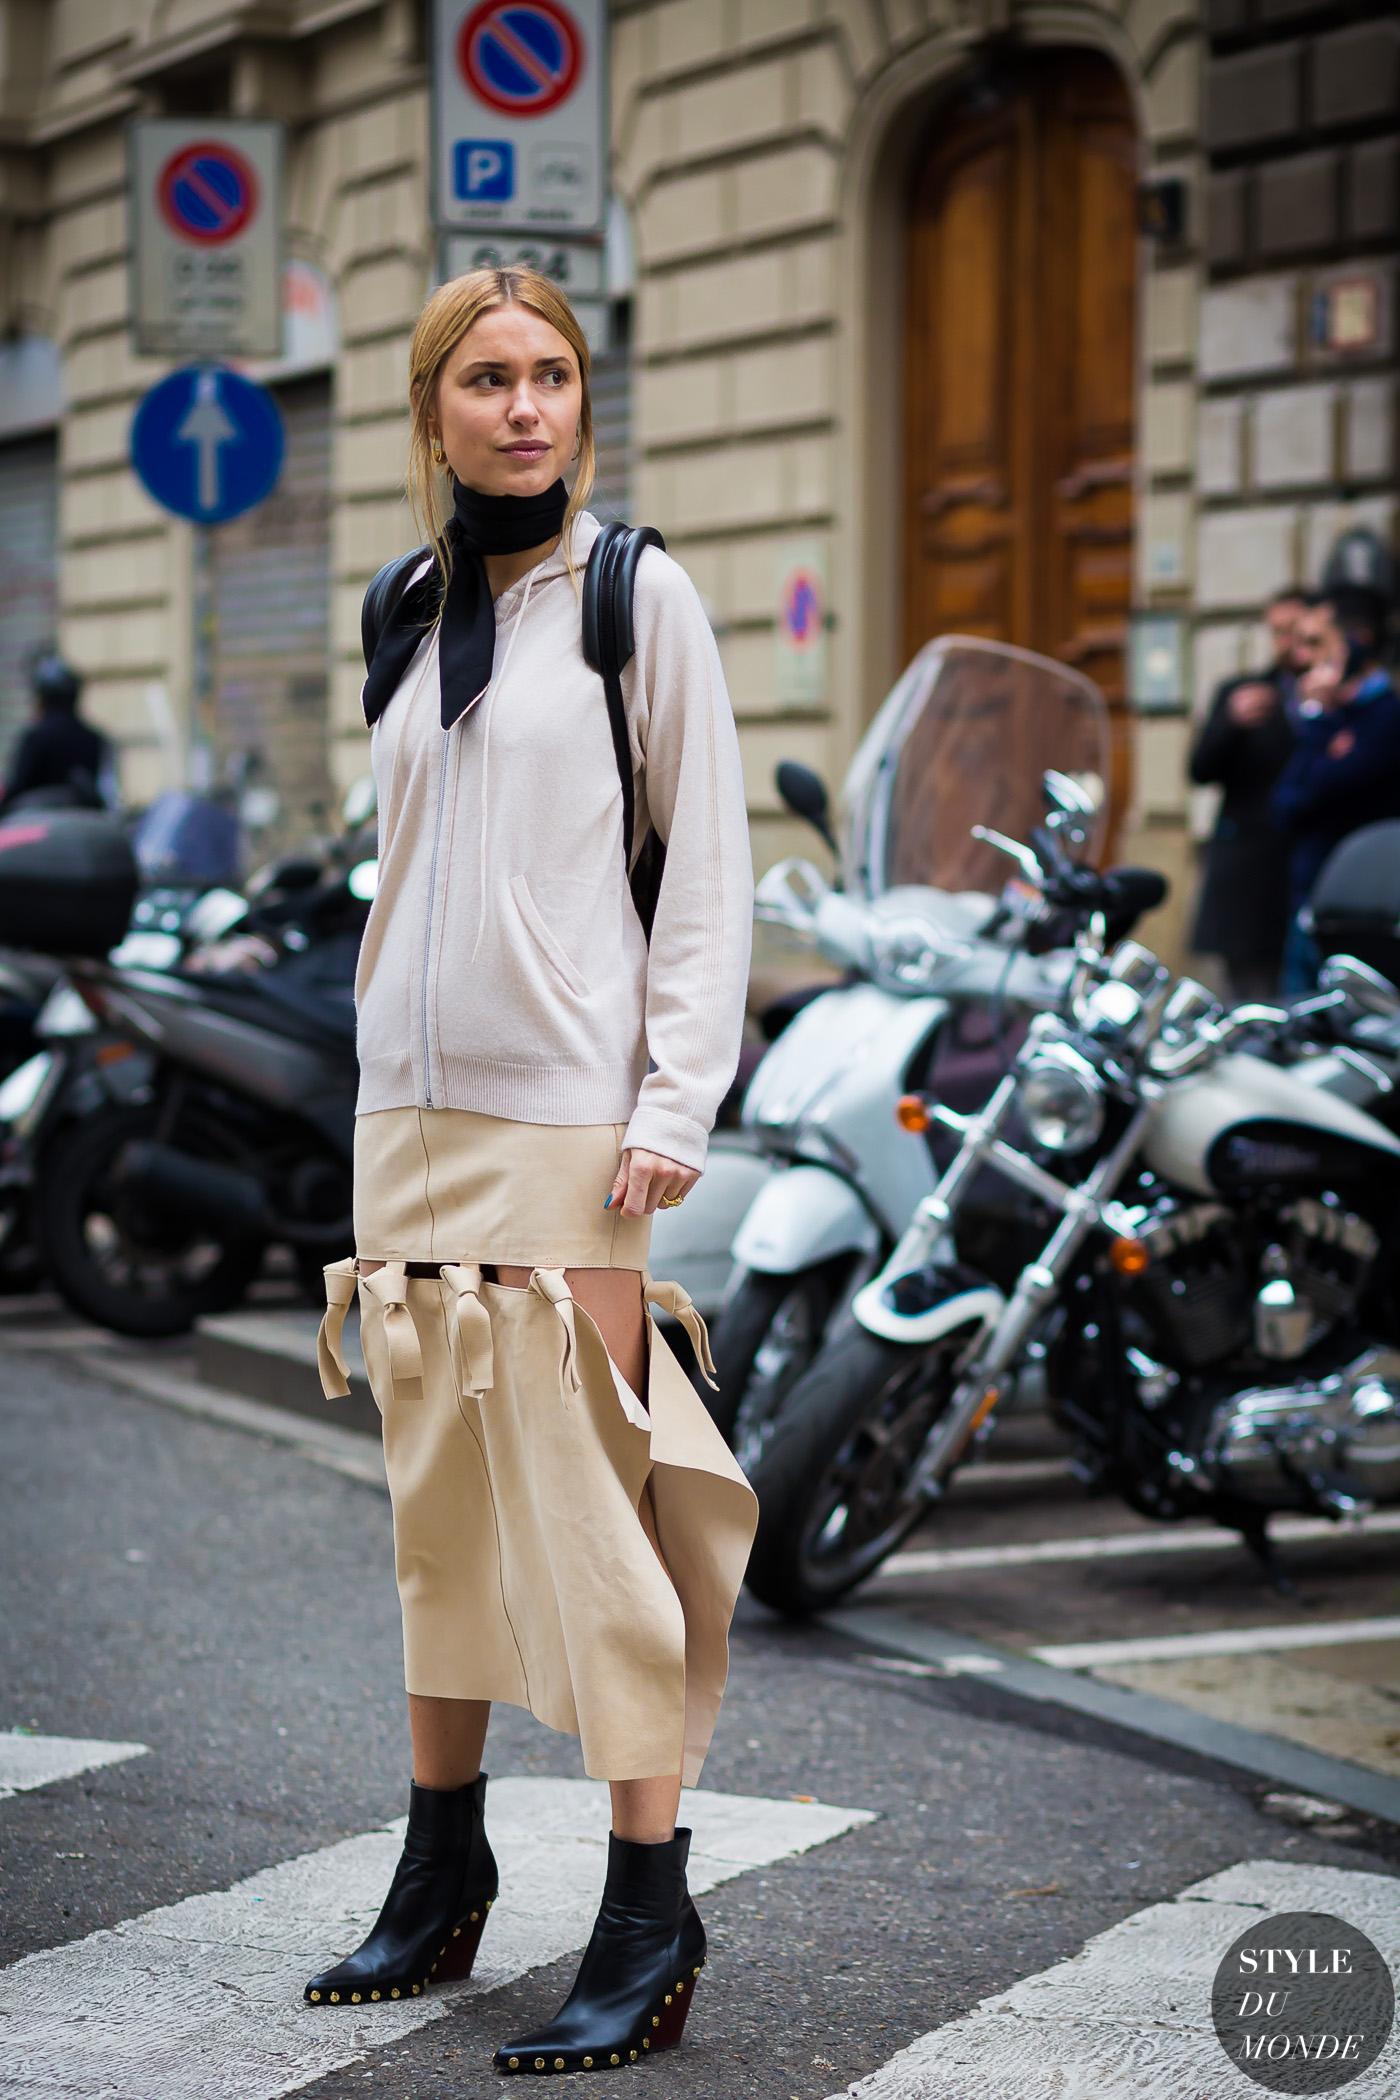 Milan Fashion Week Fw 2016 Street Style Pernille Teisbaek Style Du Monde Street Style